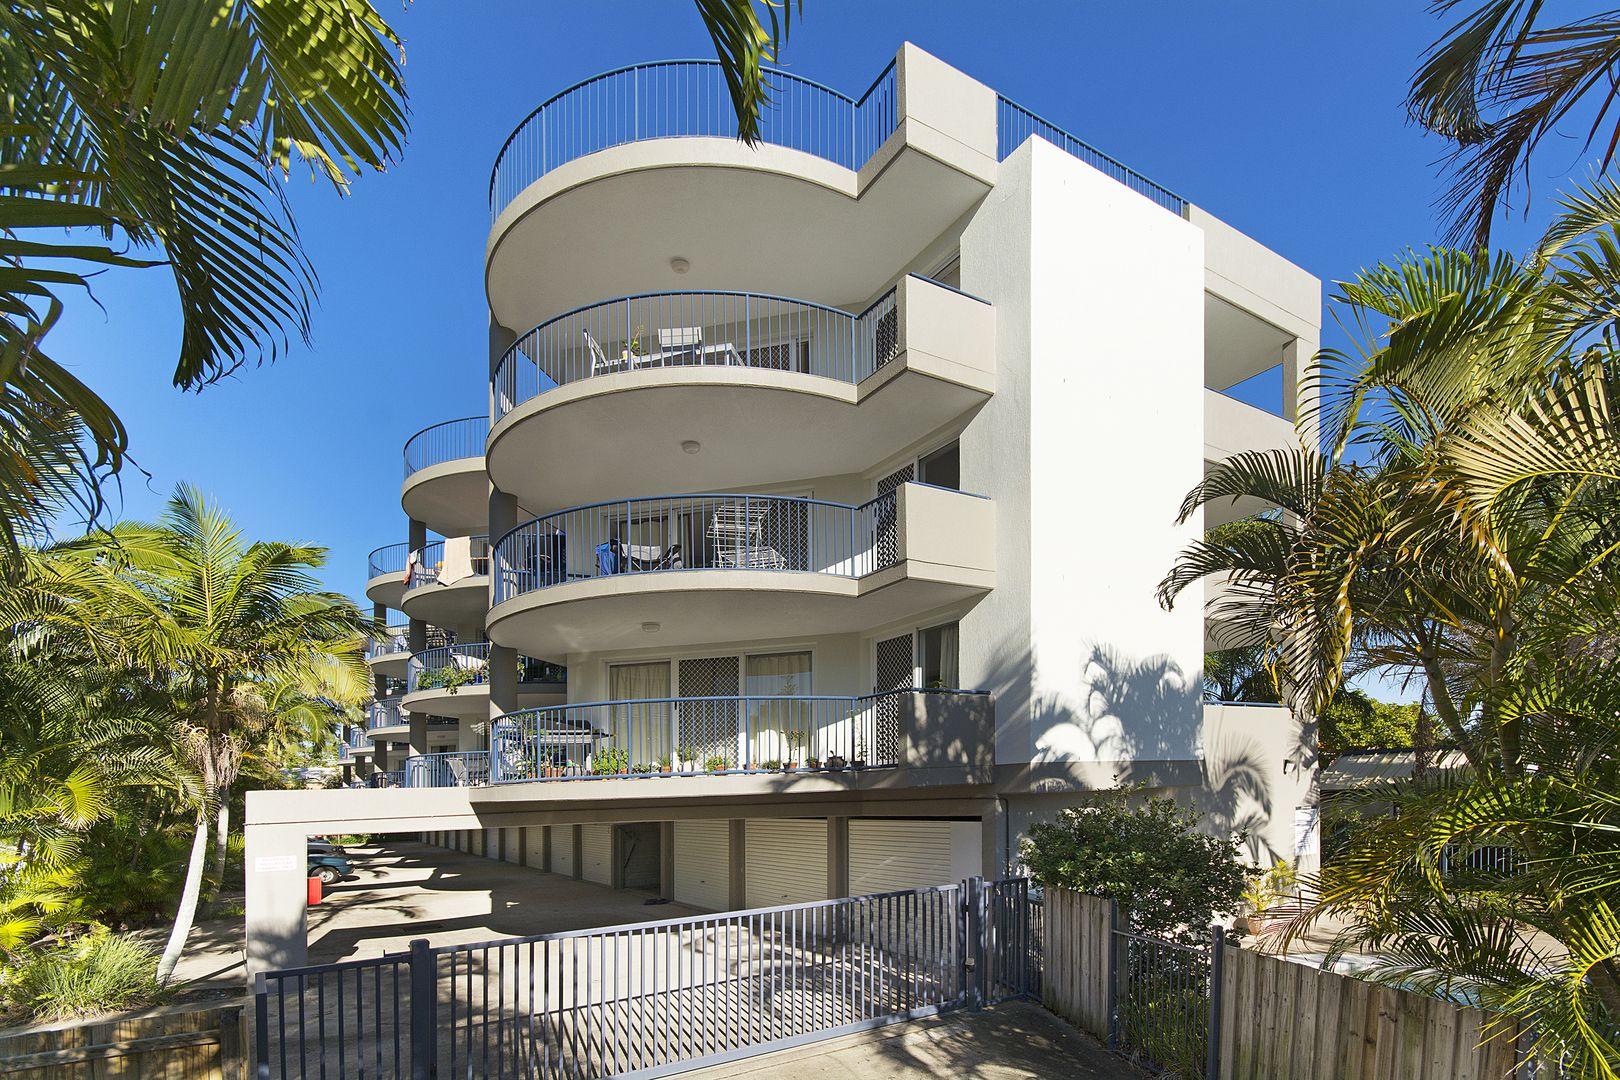 8/11 Foote Street, Mooloolaba QLD 4557, Image 0